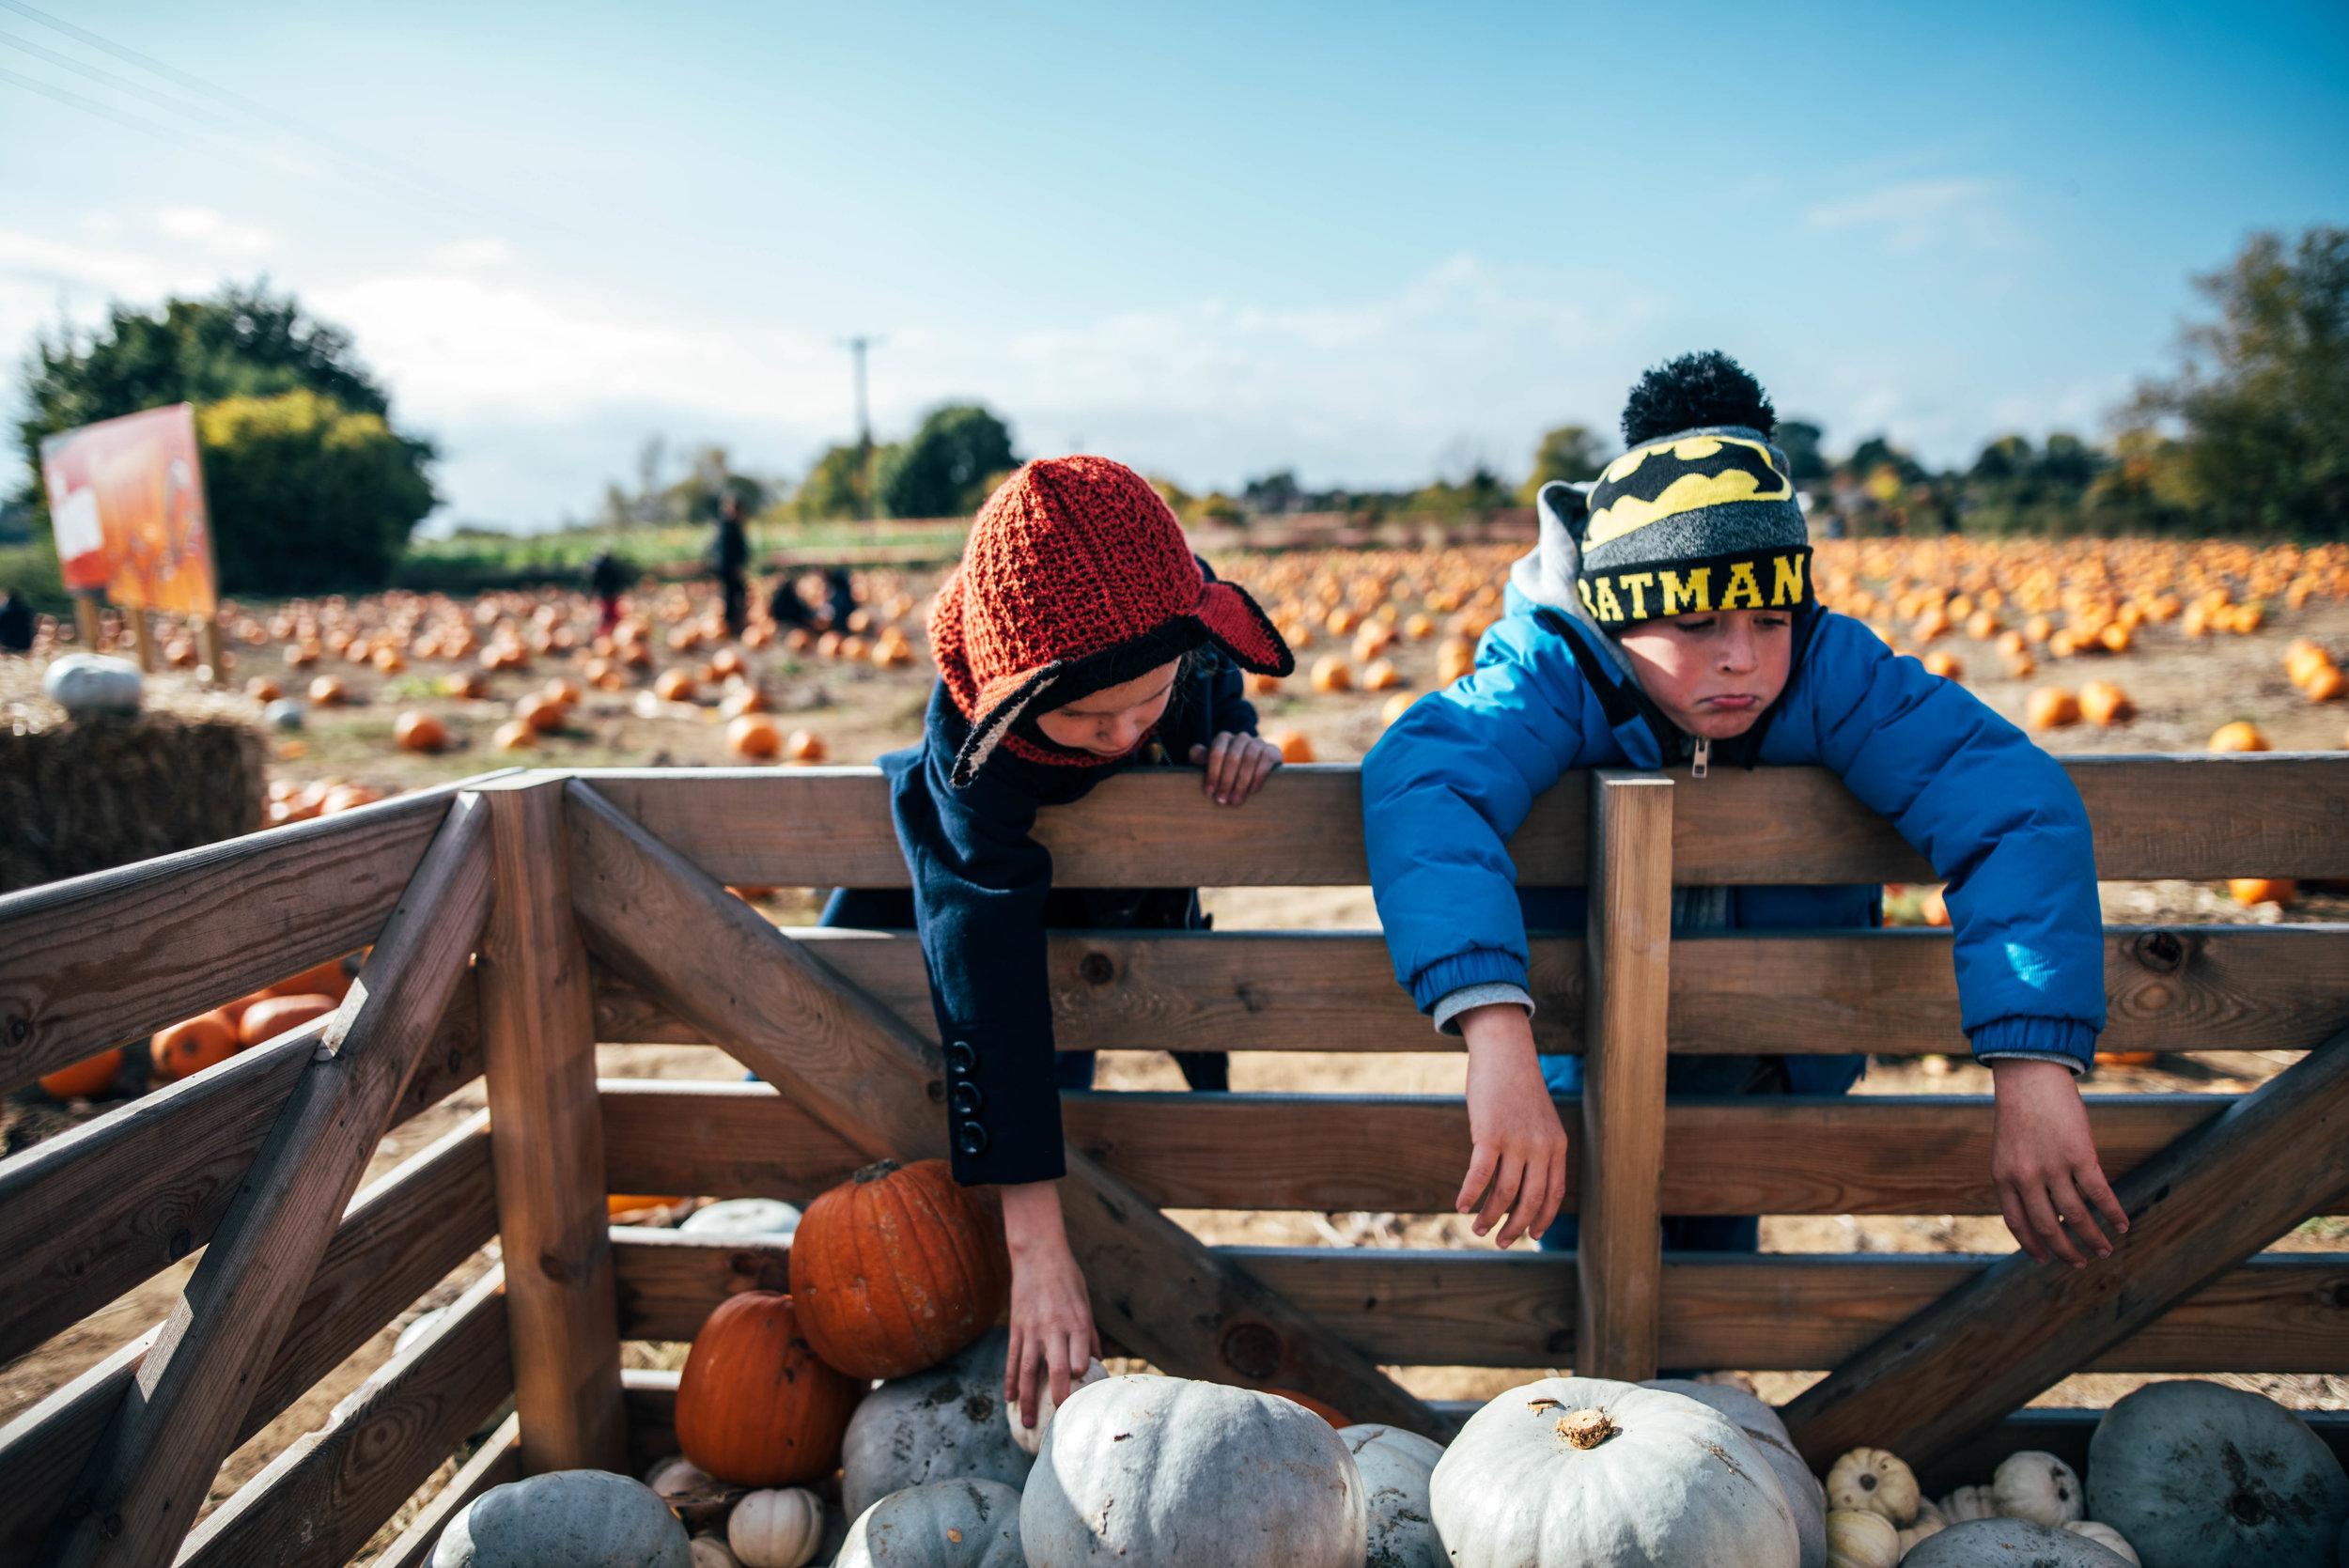 Two kids hang on Pumpkin crate Essex UK Documentary Portrait Photographer